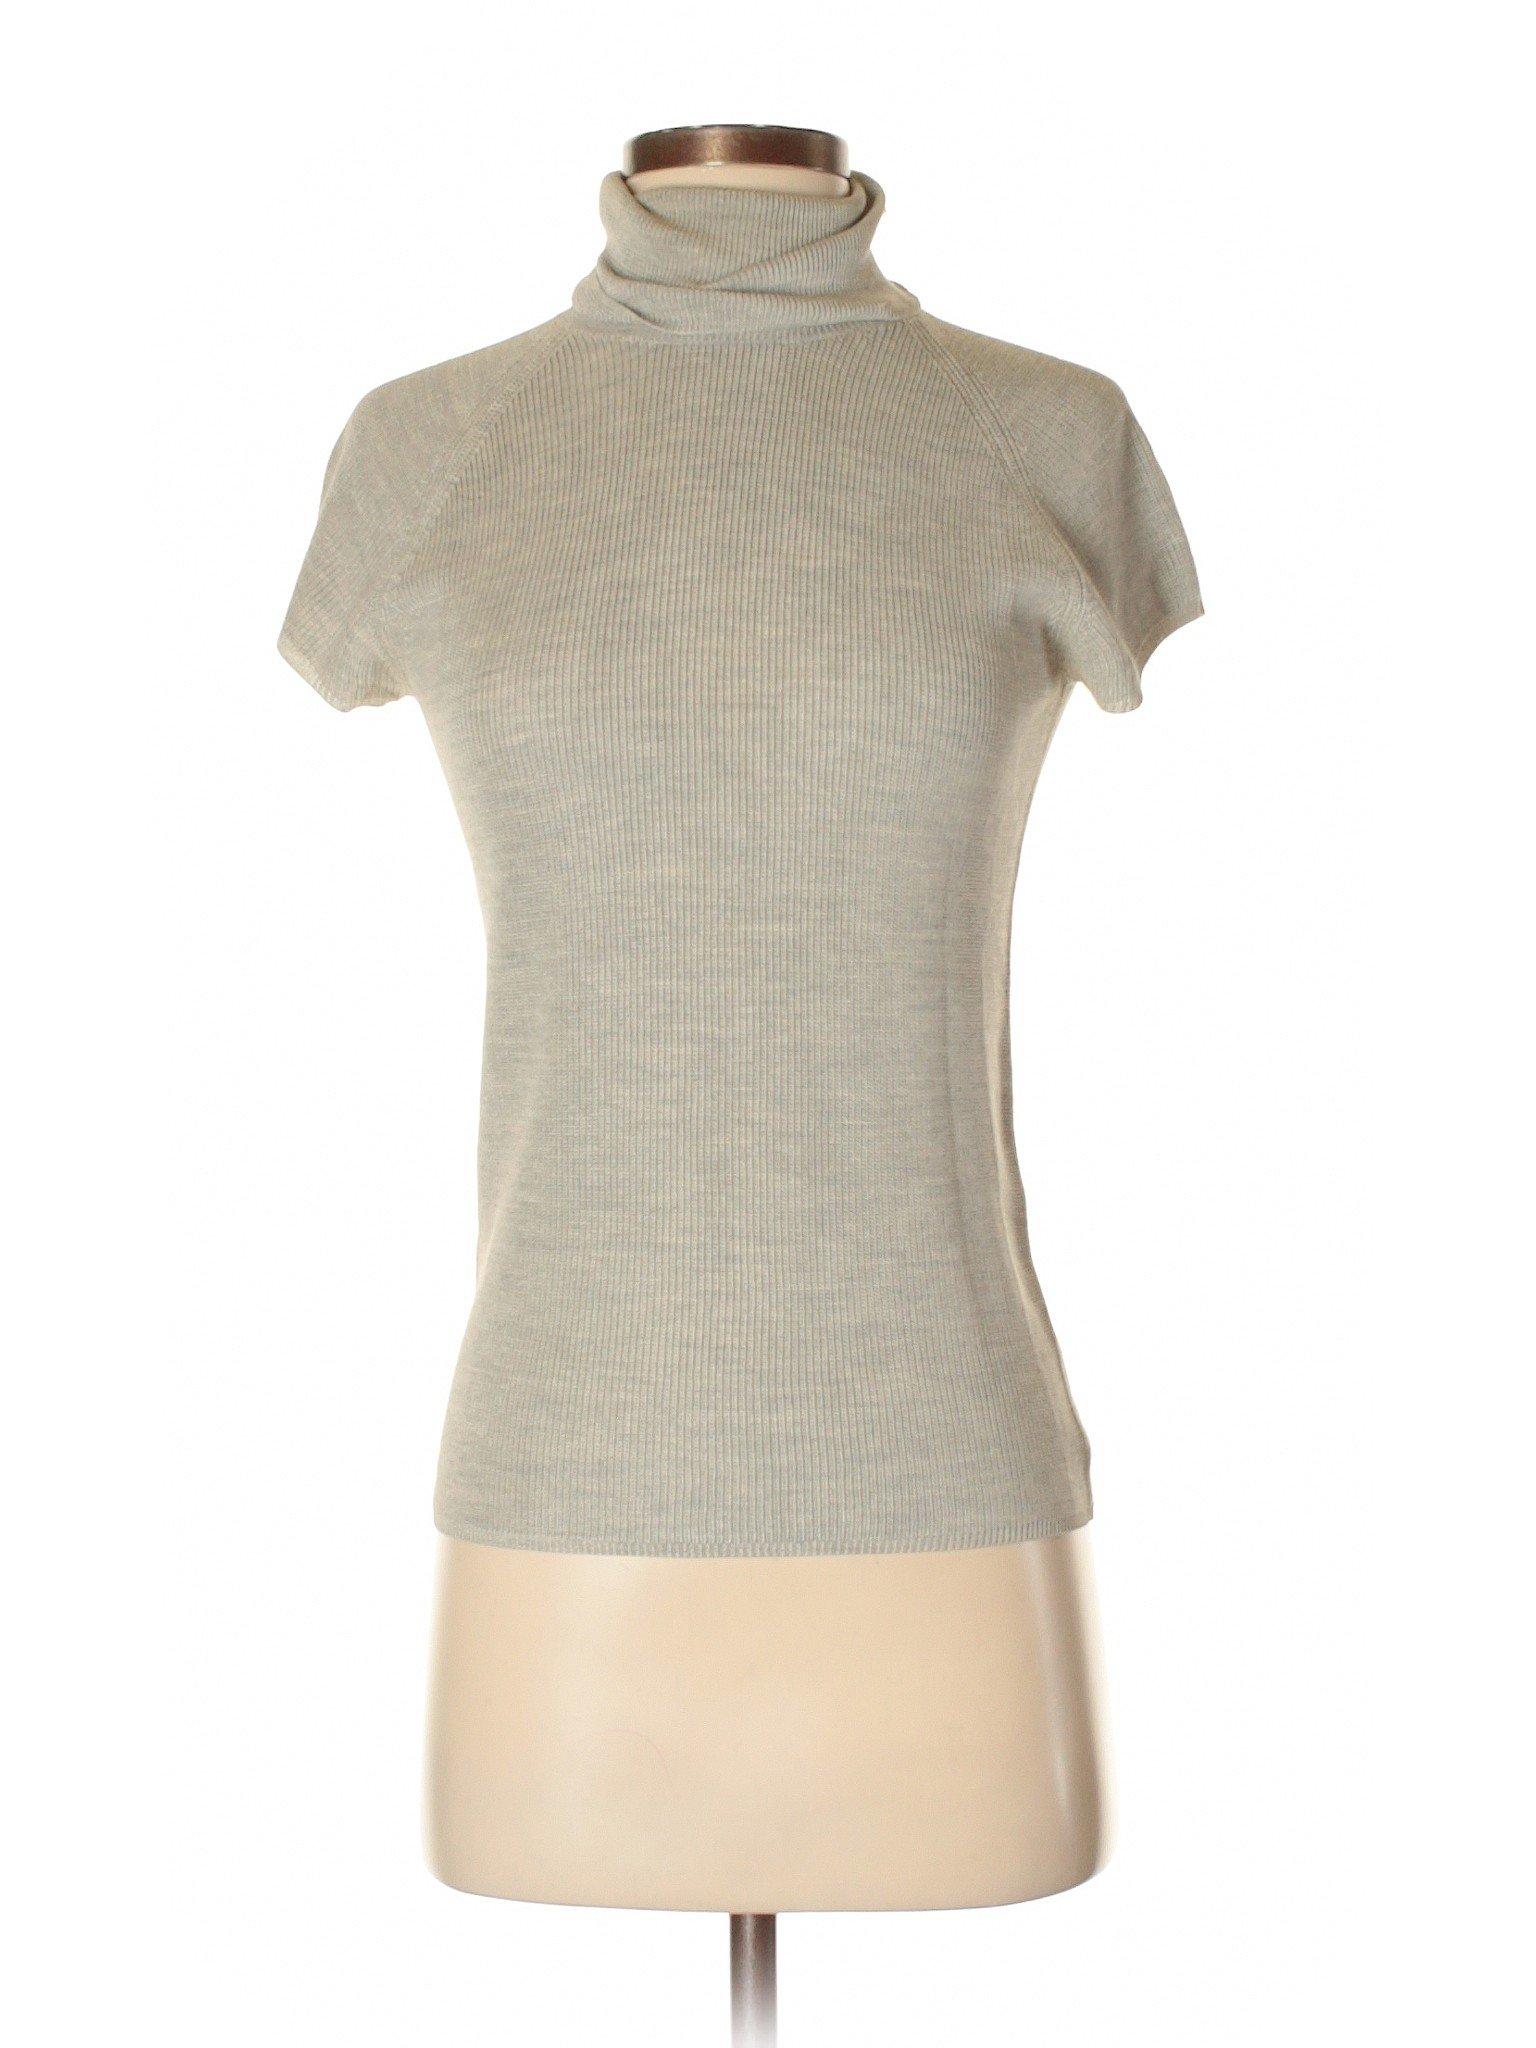 Sweater Isaac Pullover New Mizrahi Boutique York Silk CRYxTx